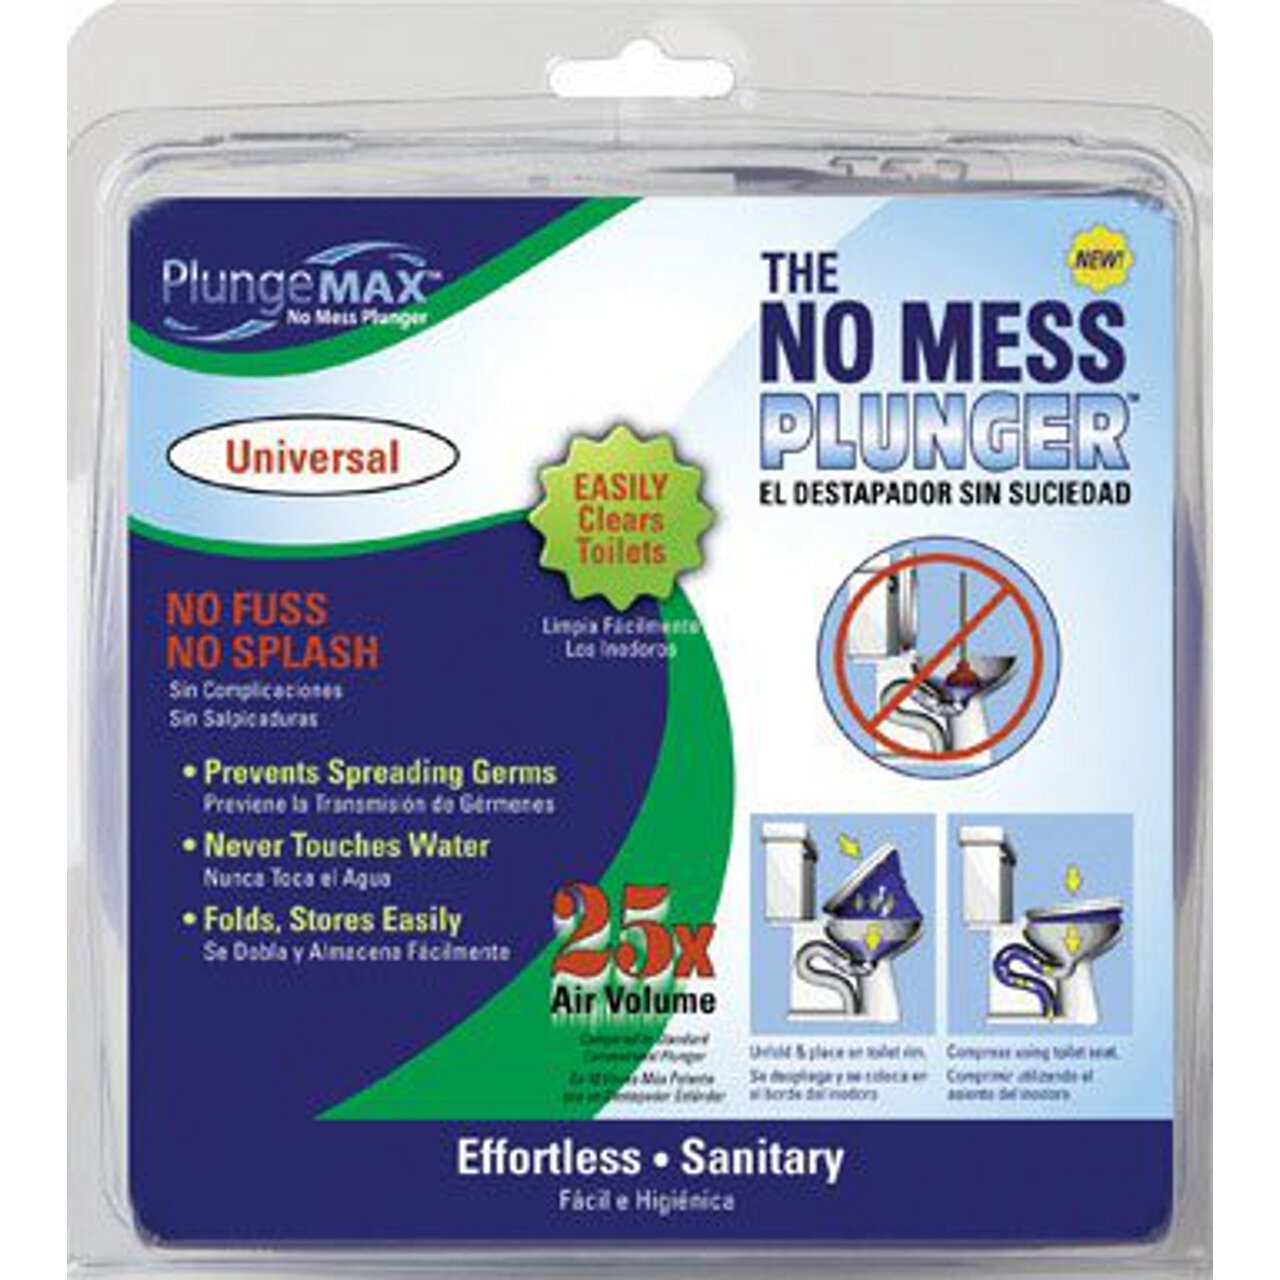 PF Waterworks PF0501 PlungeMAX No Mess Sanitary Toilet Plunger